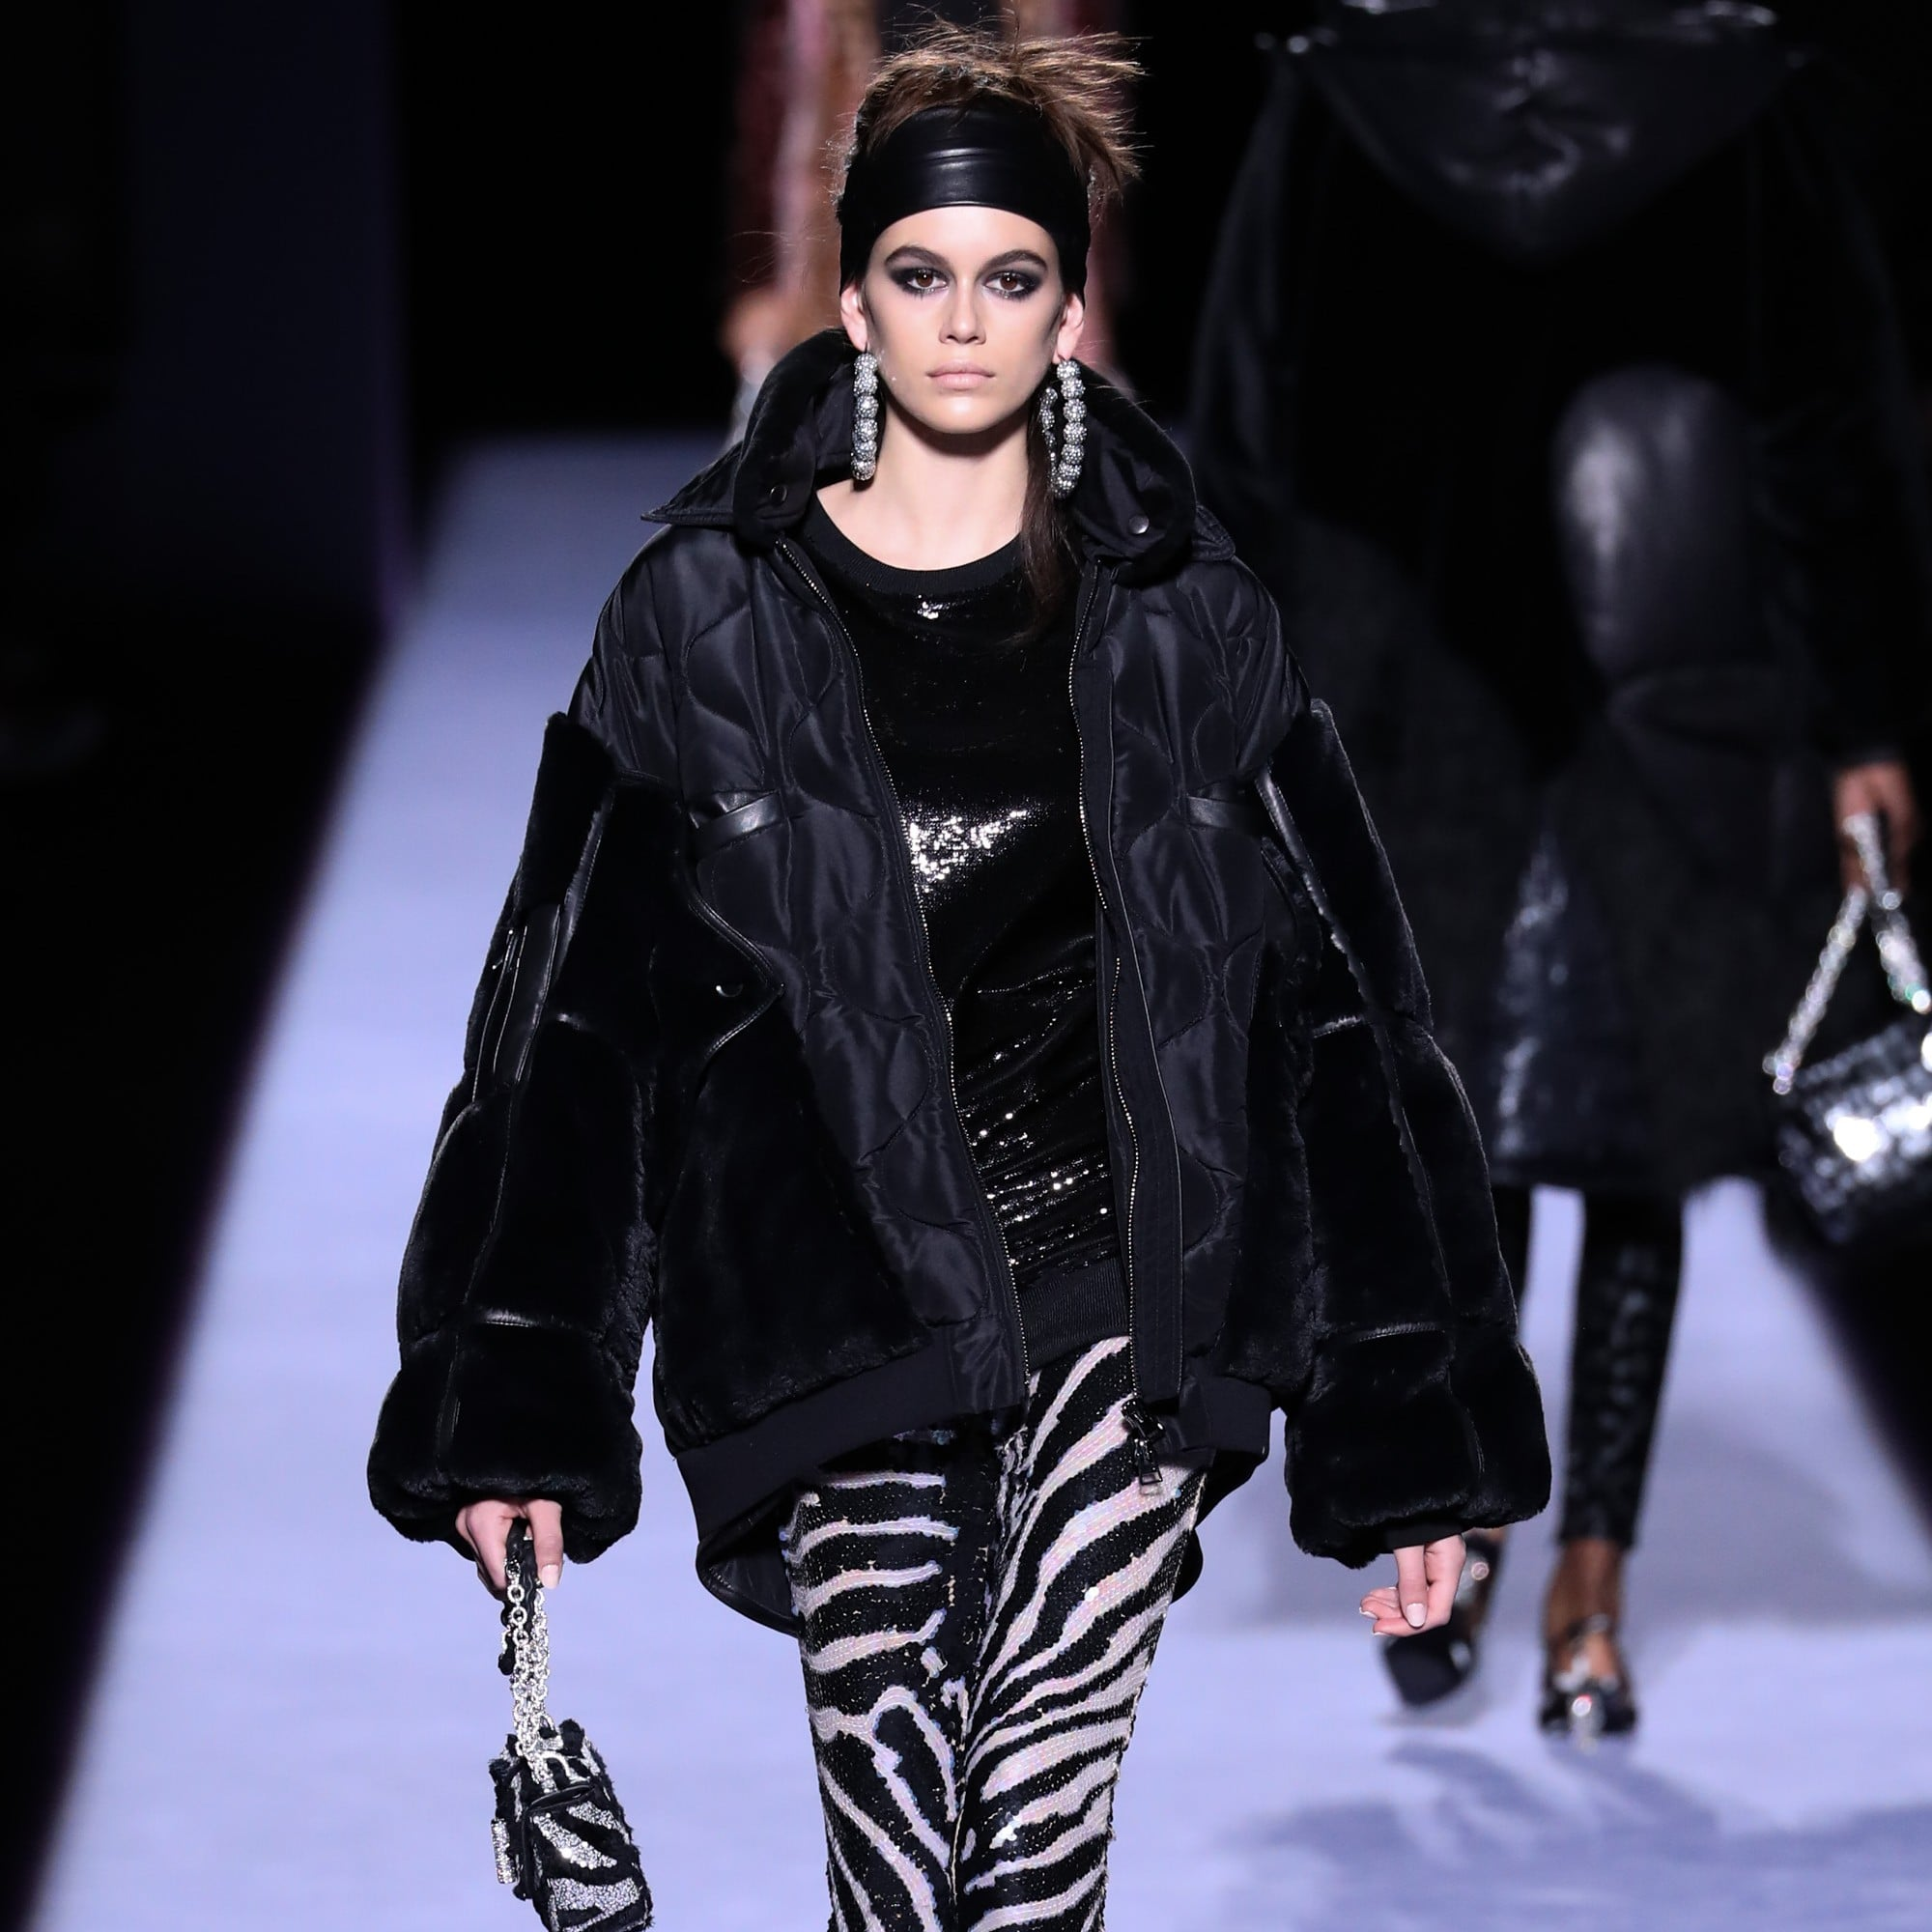 1f64d89b79d7 Kaia Gerber at Fashion Week Fall 2018